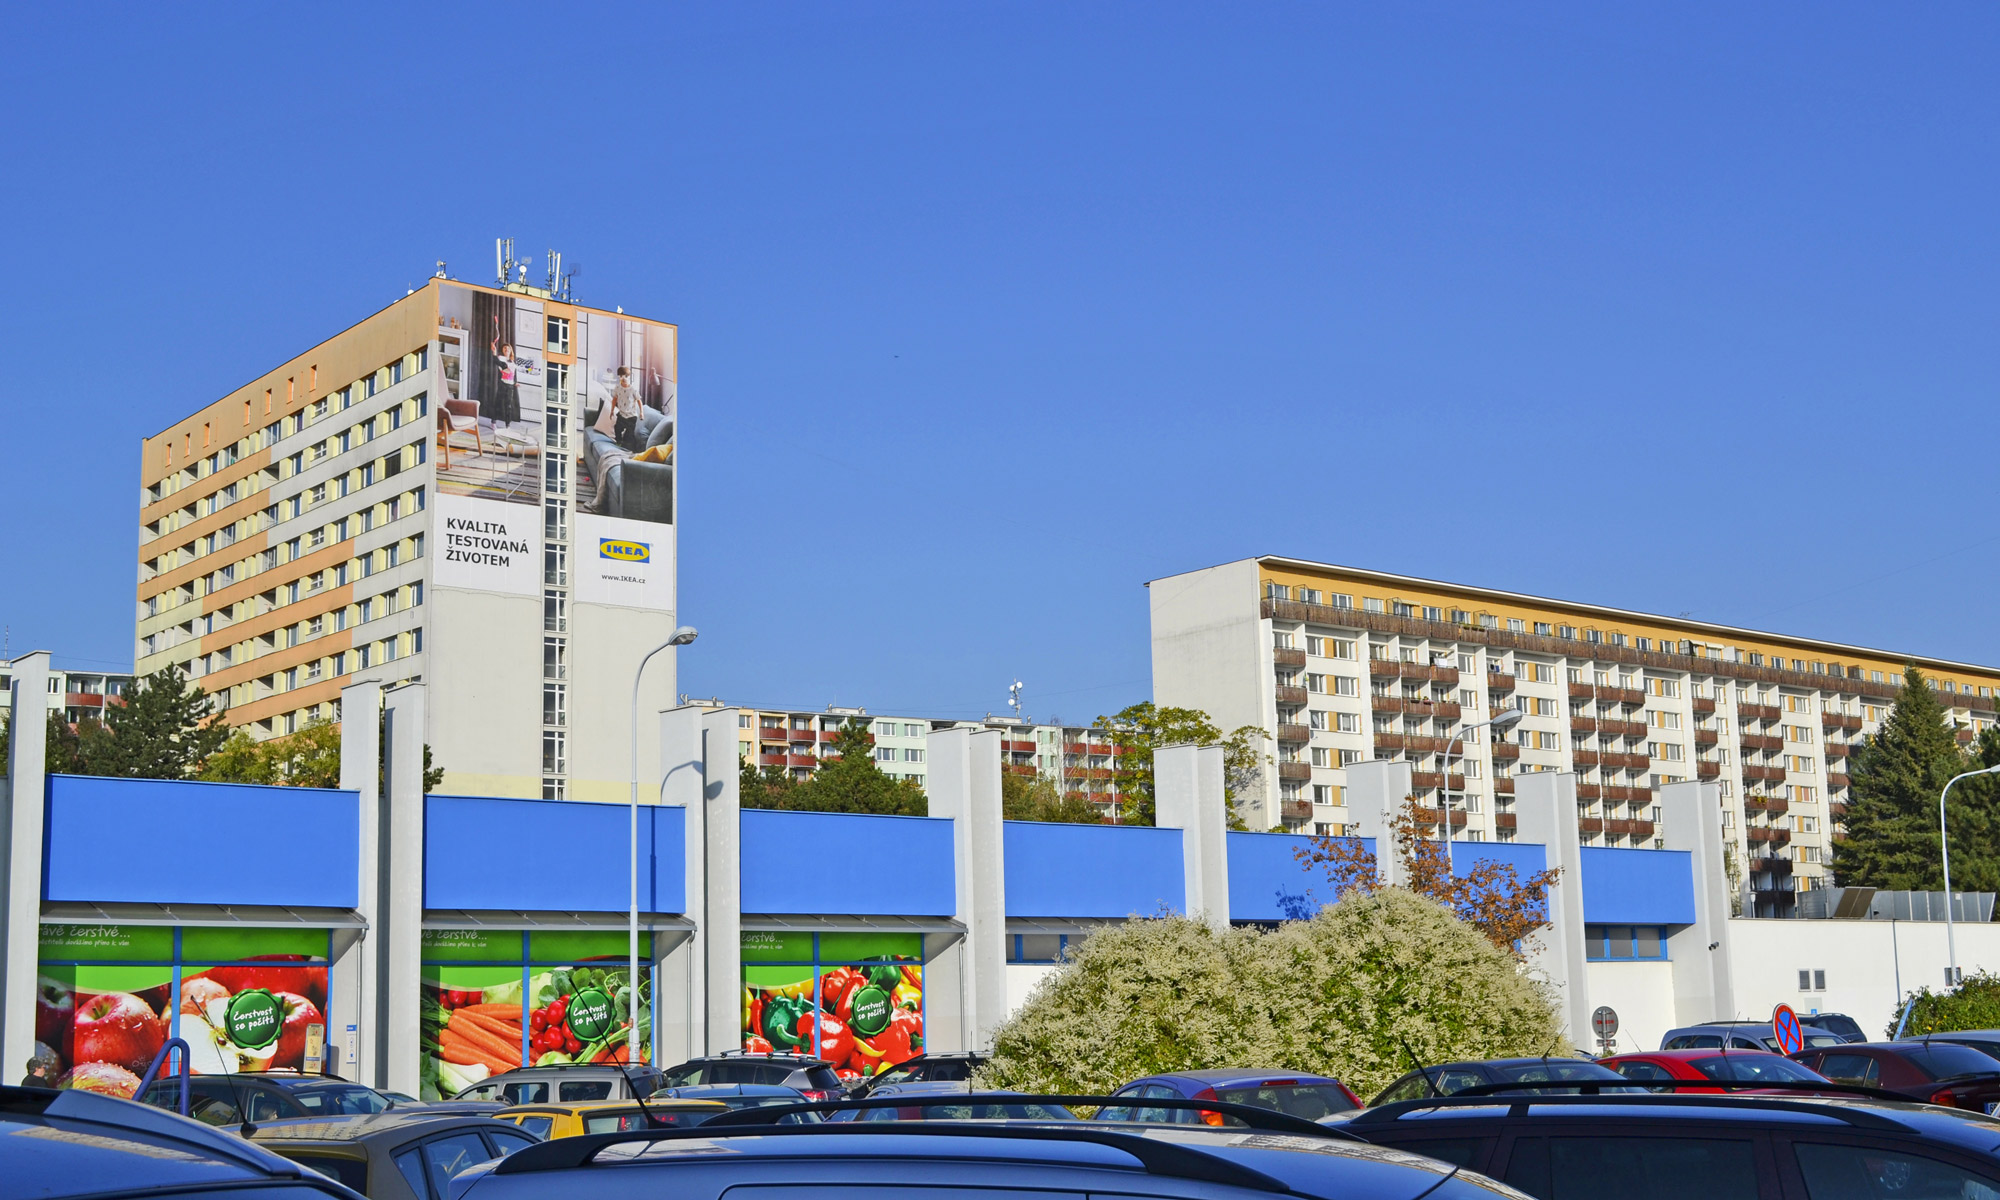 WEREK-MEDIA-Reklamni-plochy-Brno---038ZB-Halasovo-namesti---klient-IKEA---OOH-kampan-10-2018-(2)